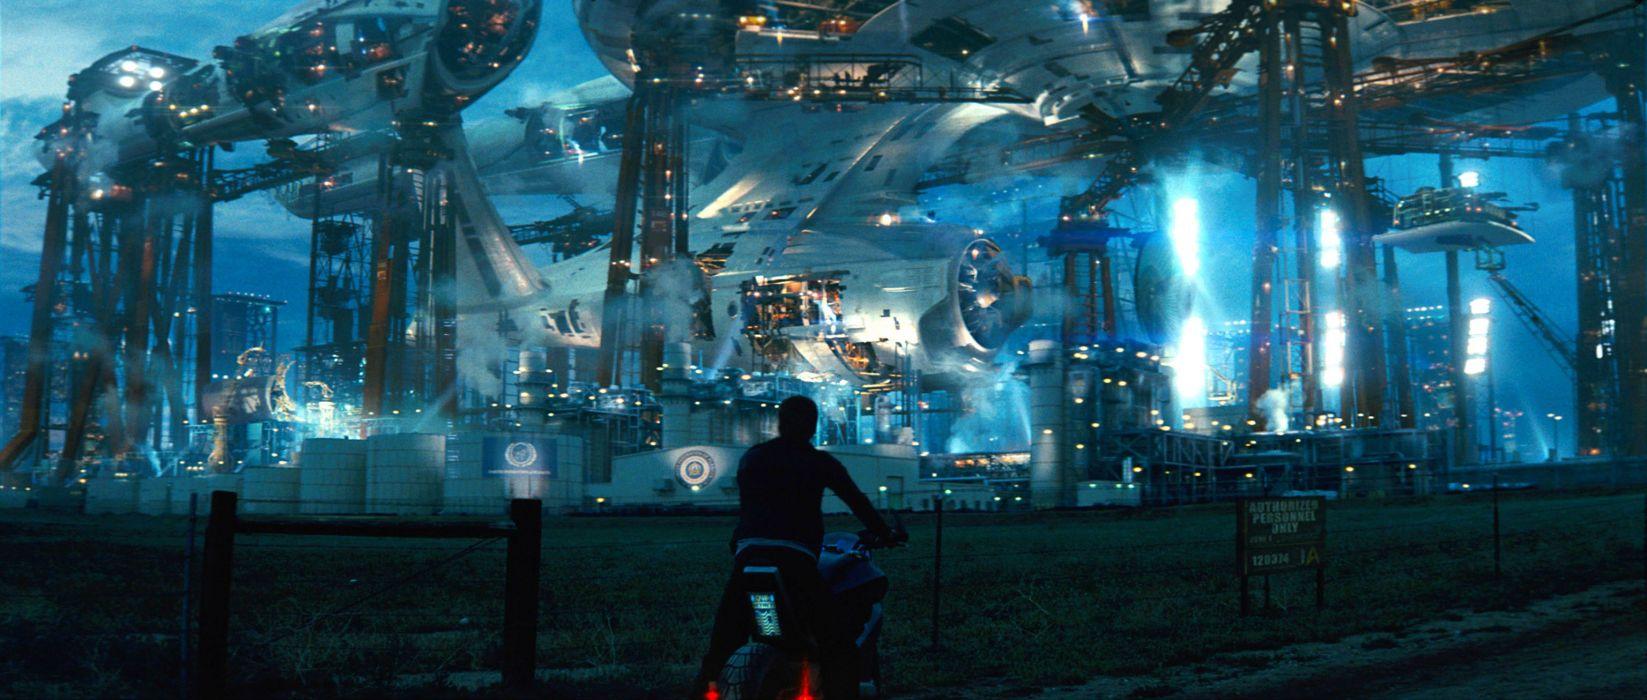 STAR-TREK-INTO-DARKNESS action sci-fi star trek darkness (118) wallpaper